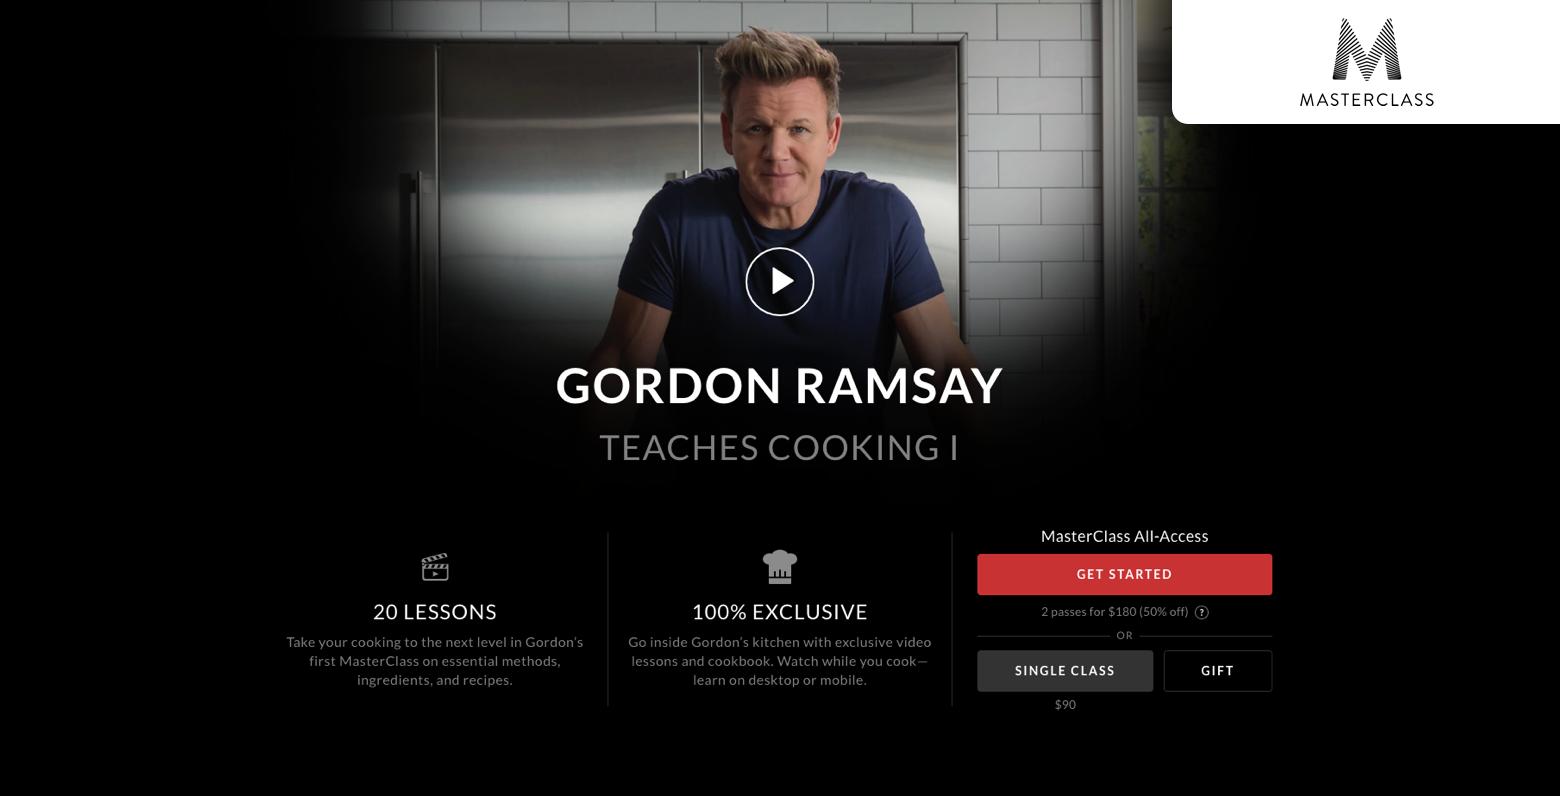 Gordon Ramsey online cooking classes